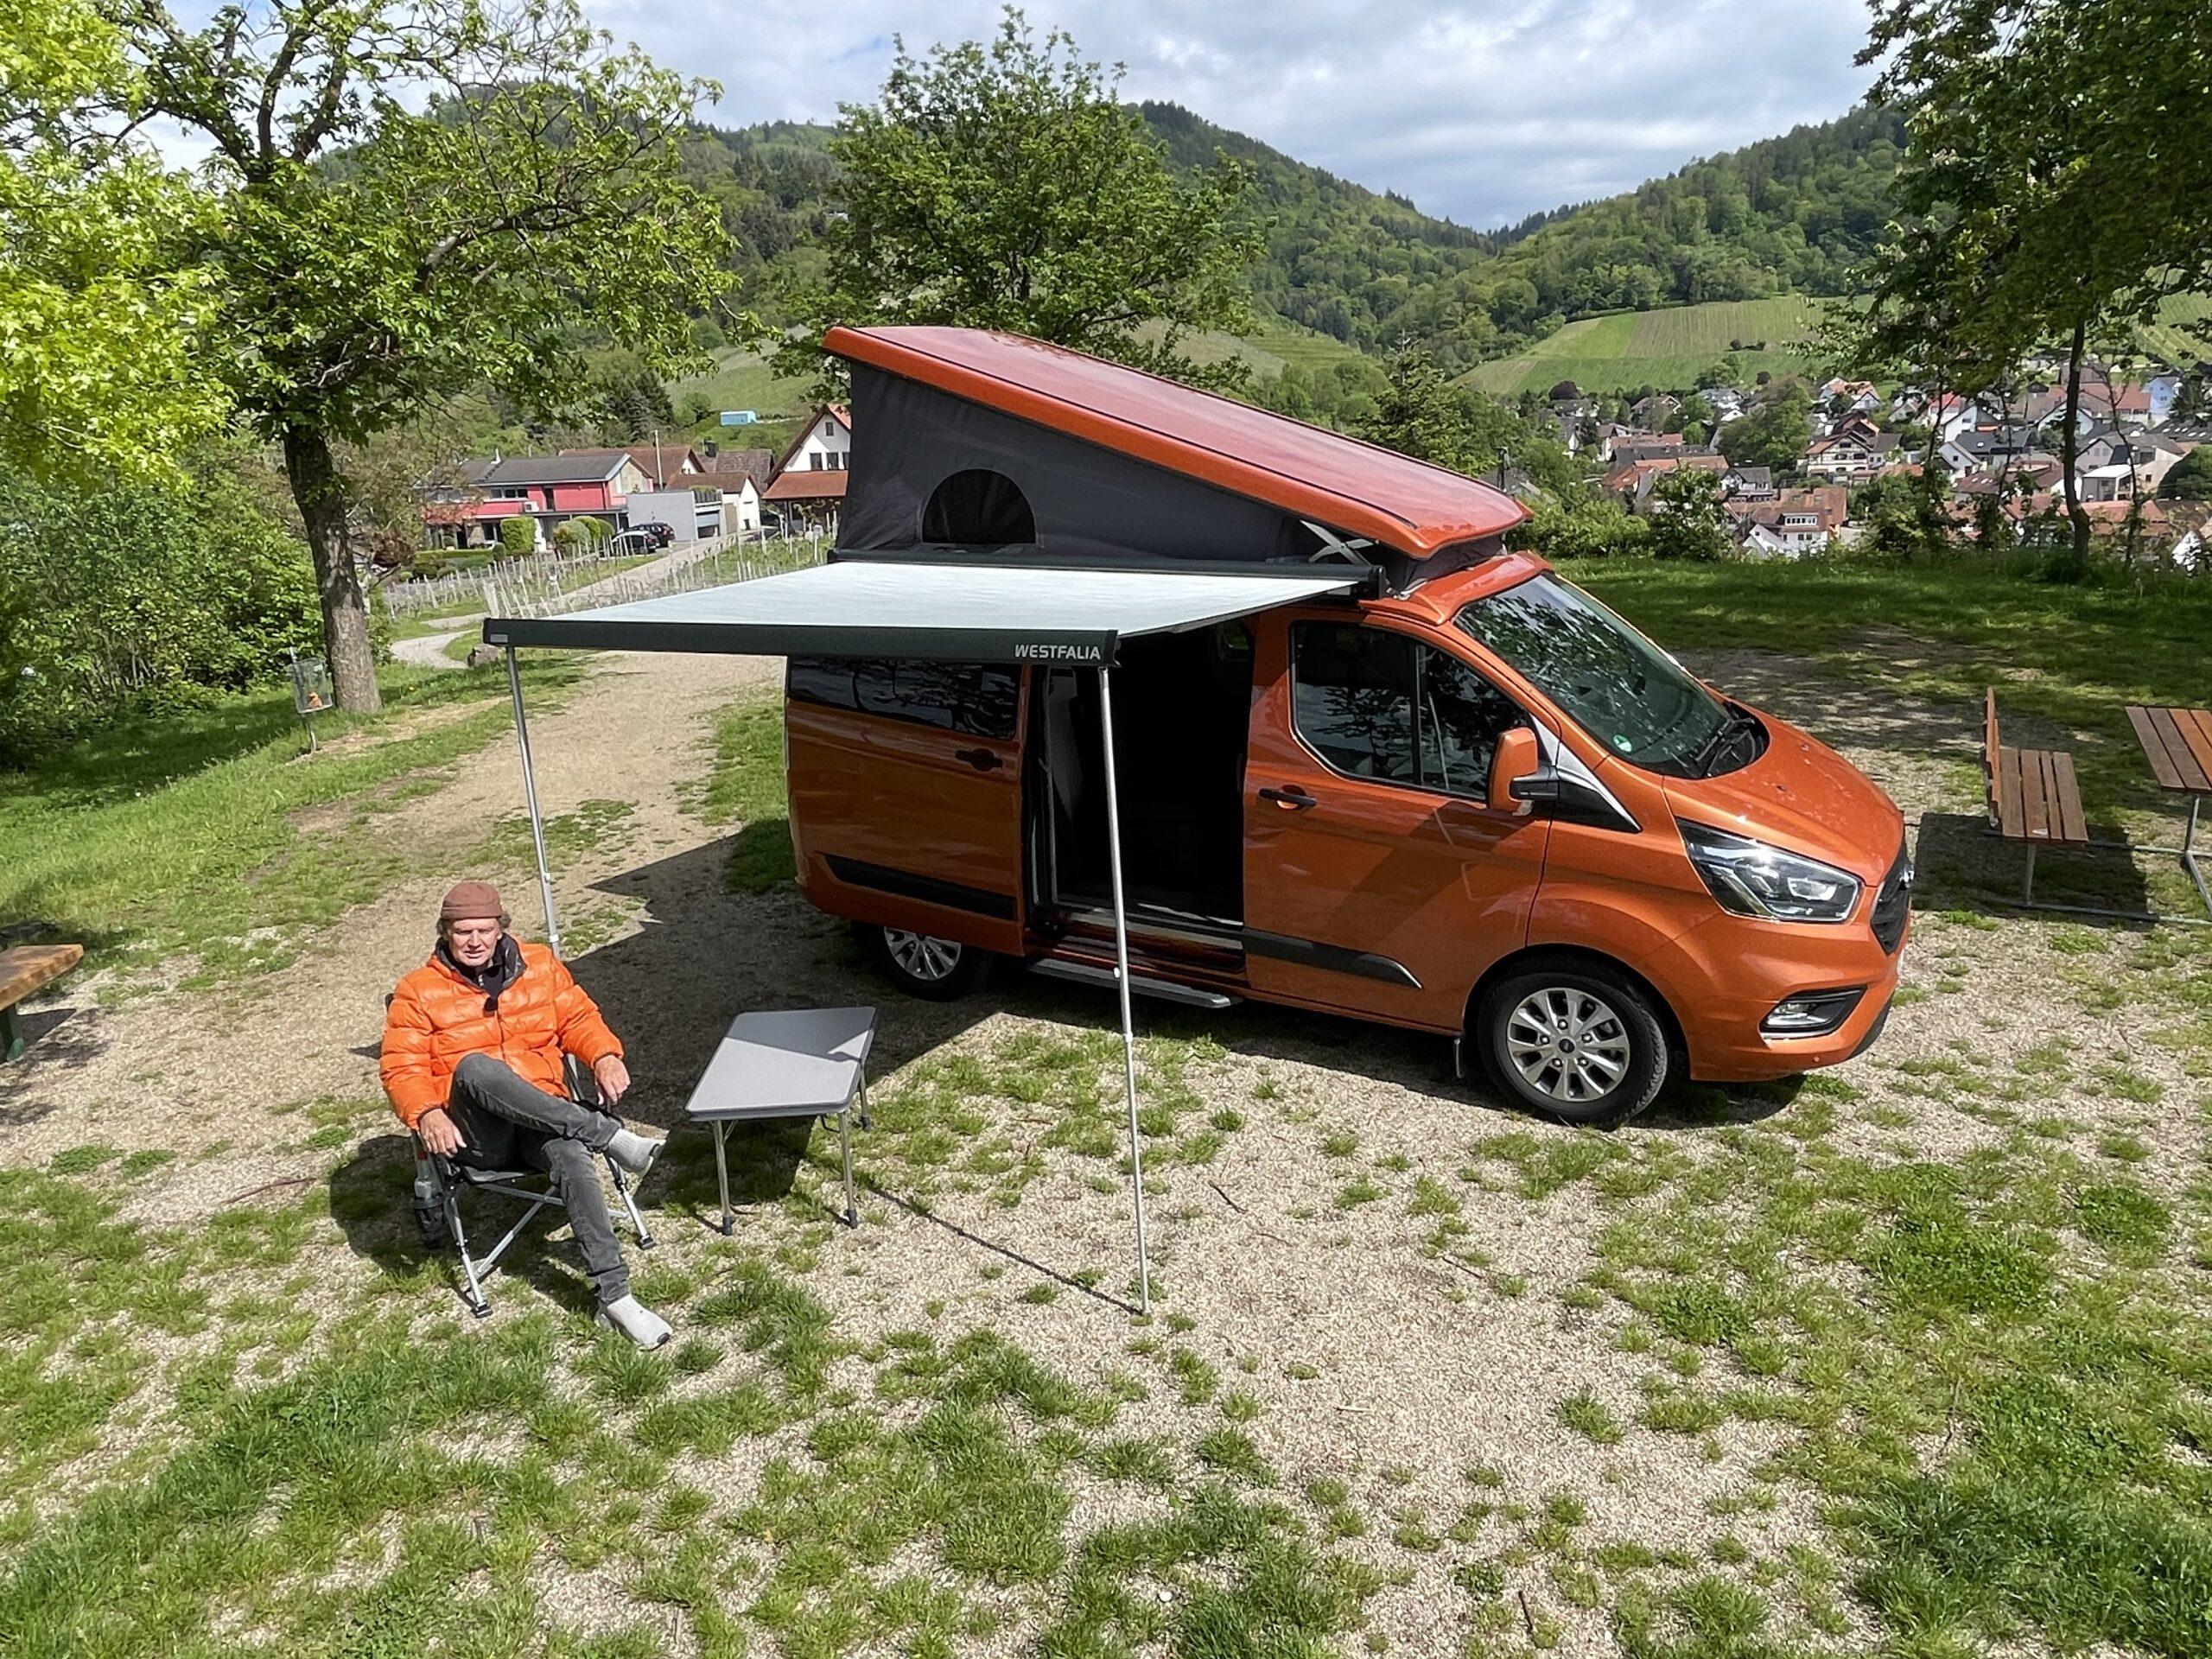 Ratgeber: Urlaub mit dem Miet-Camper